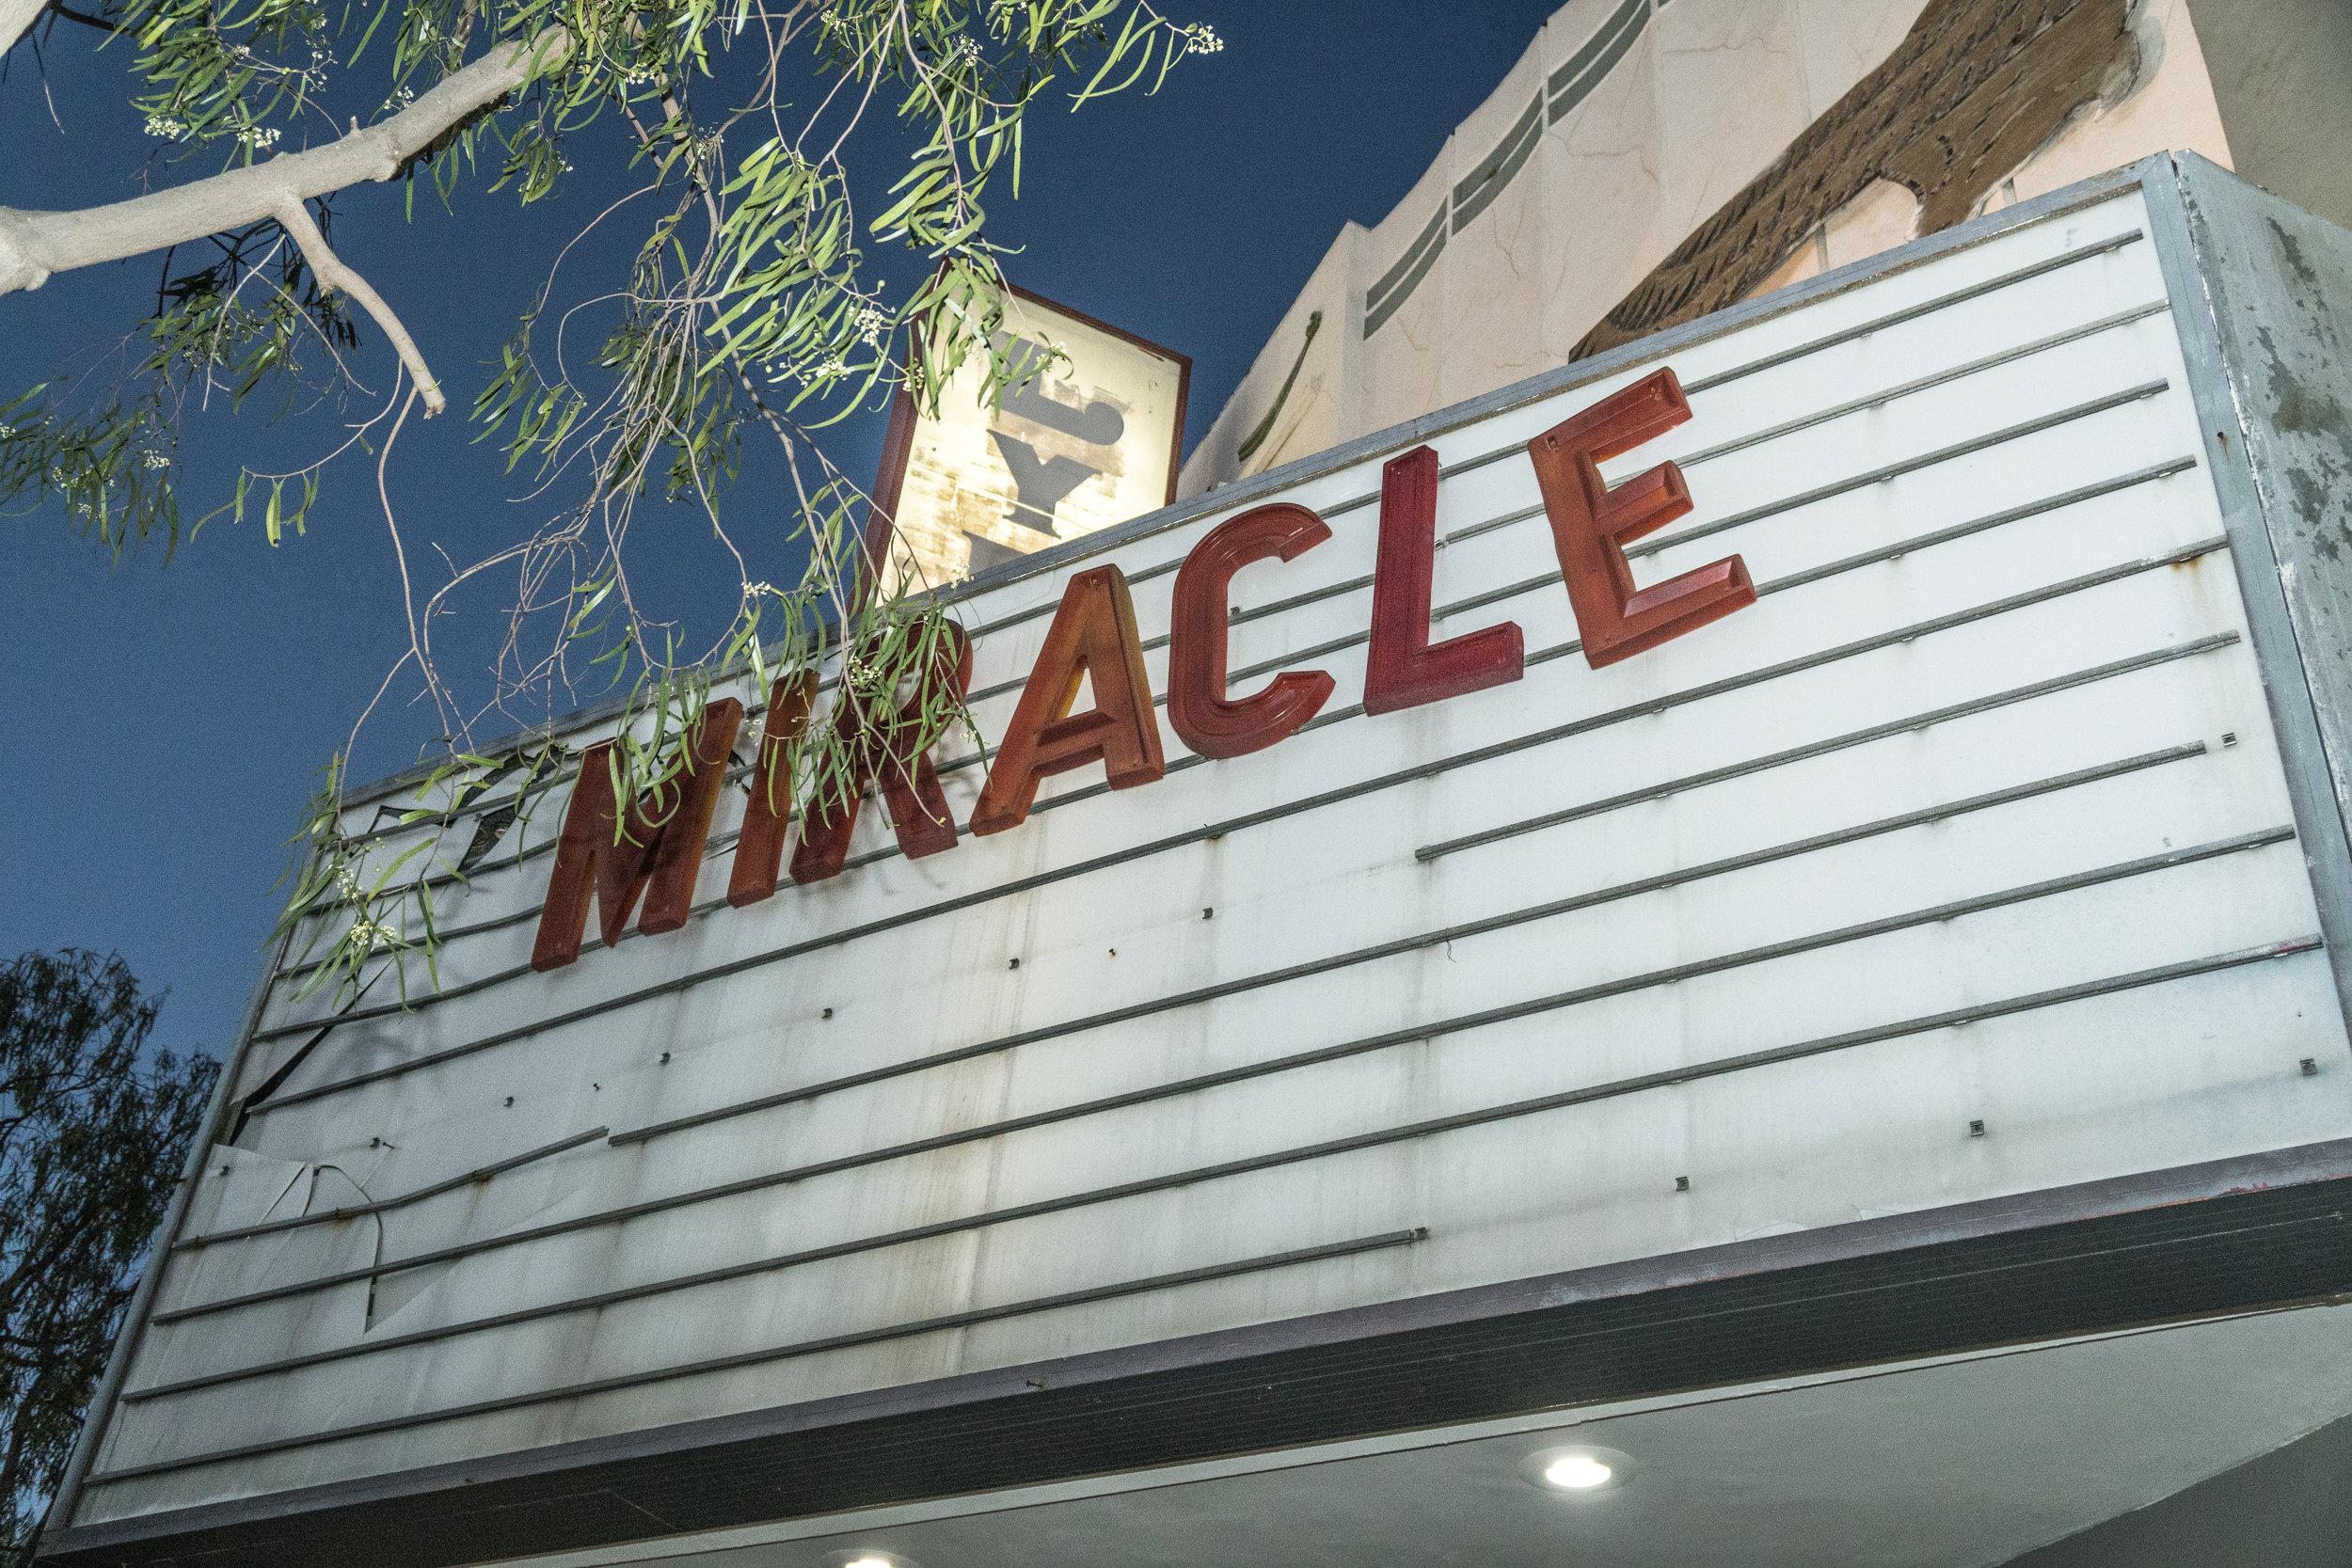 MiracleTheater-031517-219.jpg